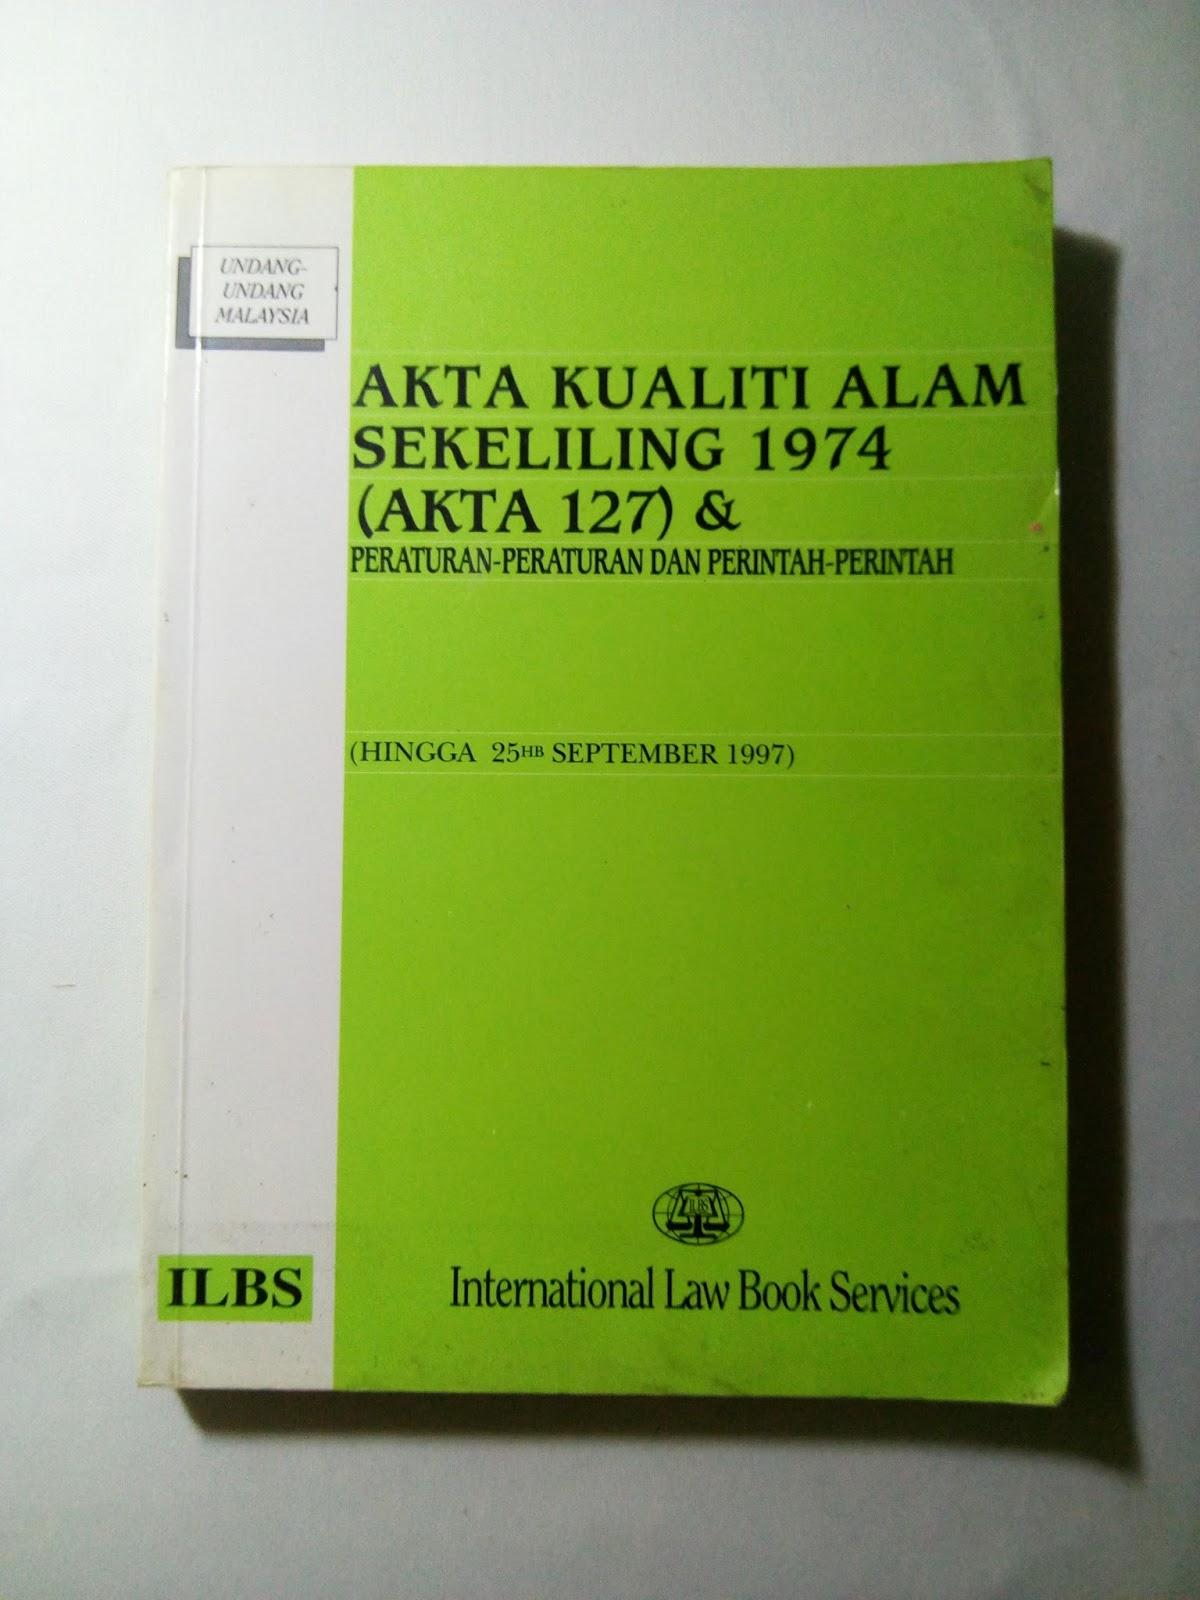 Kedai Buku Online Buku Umum